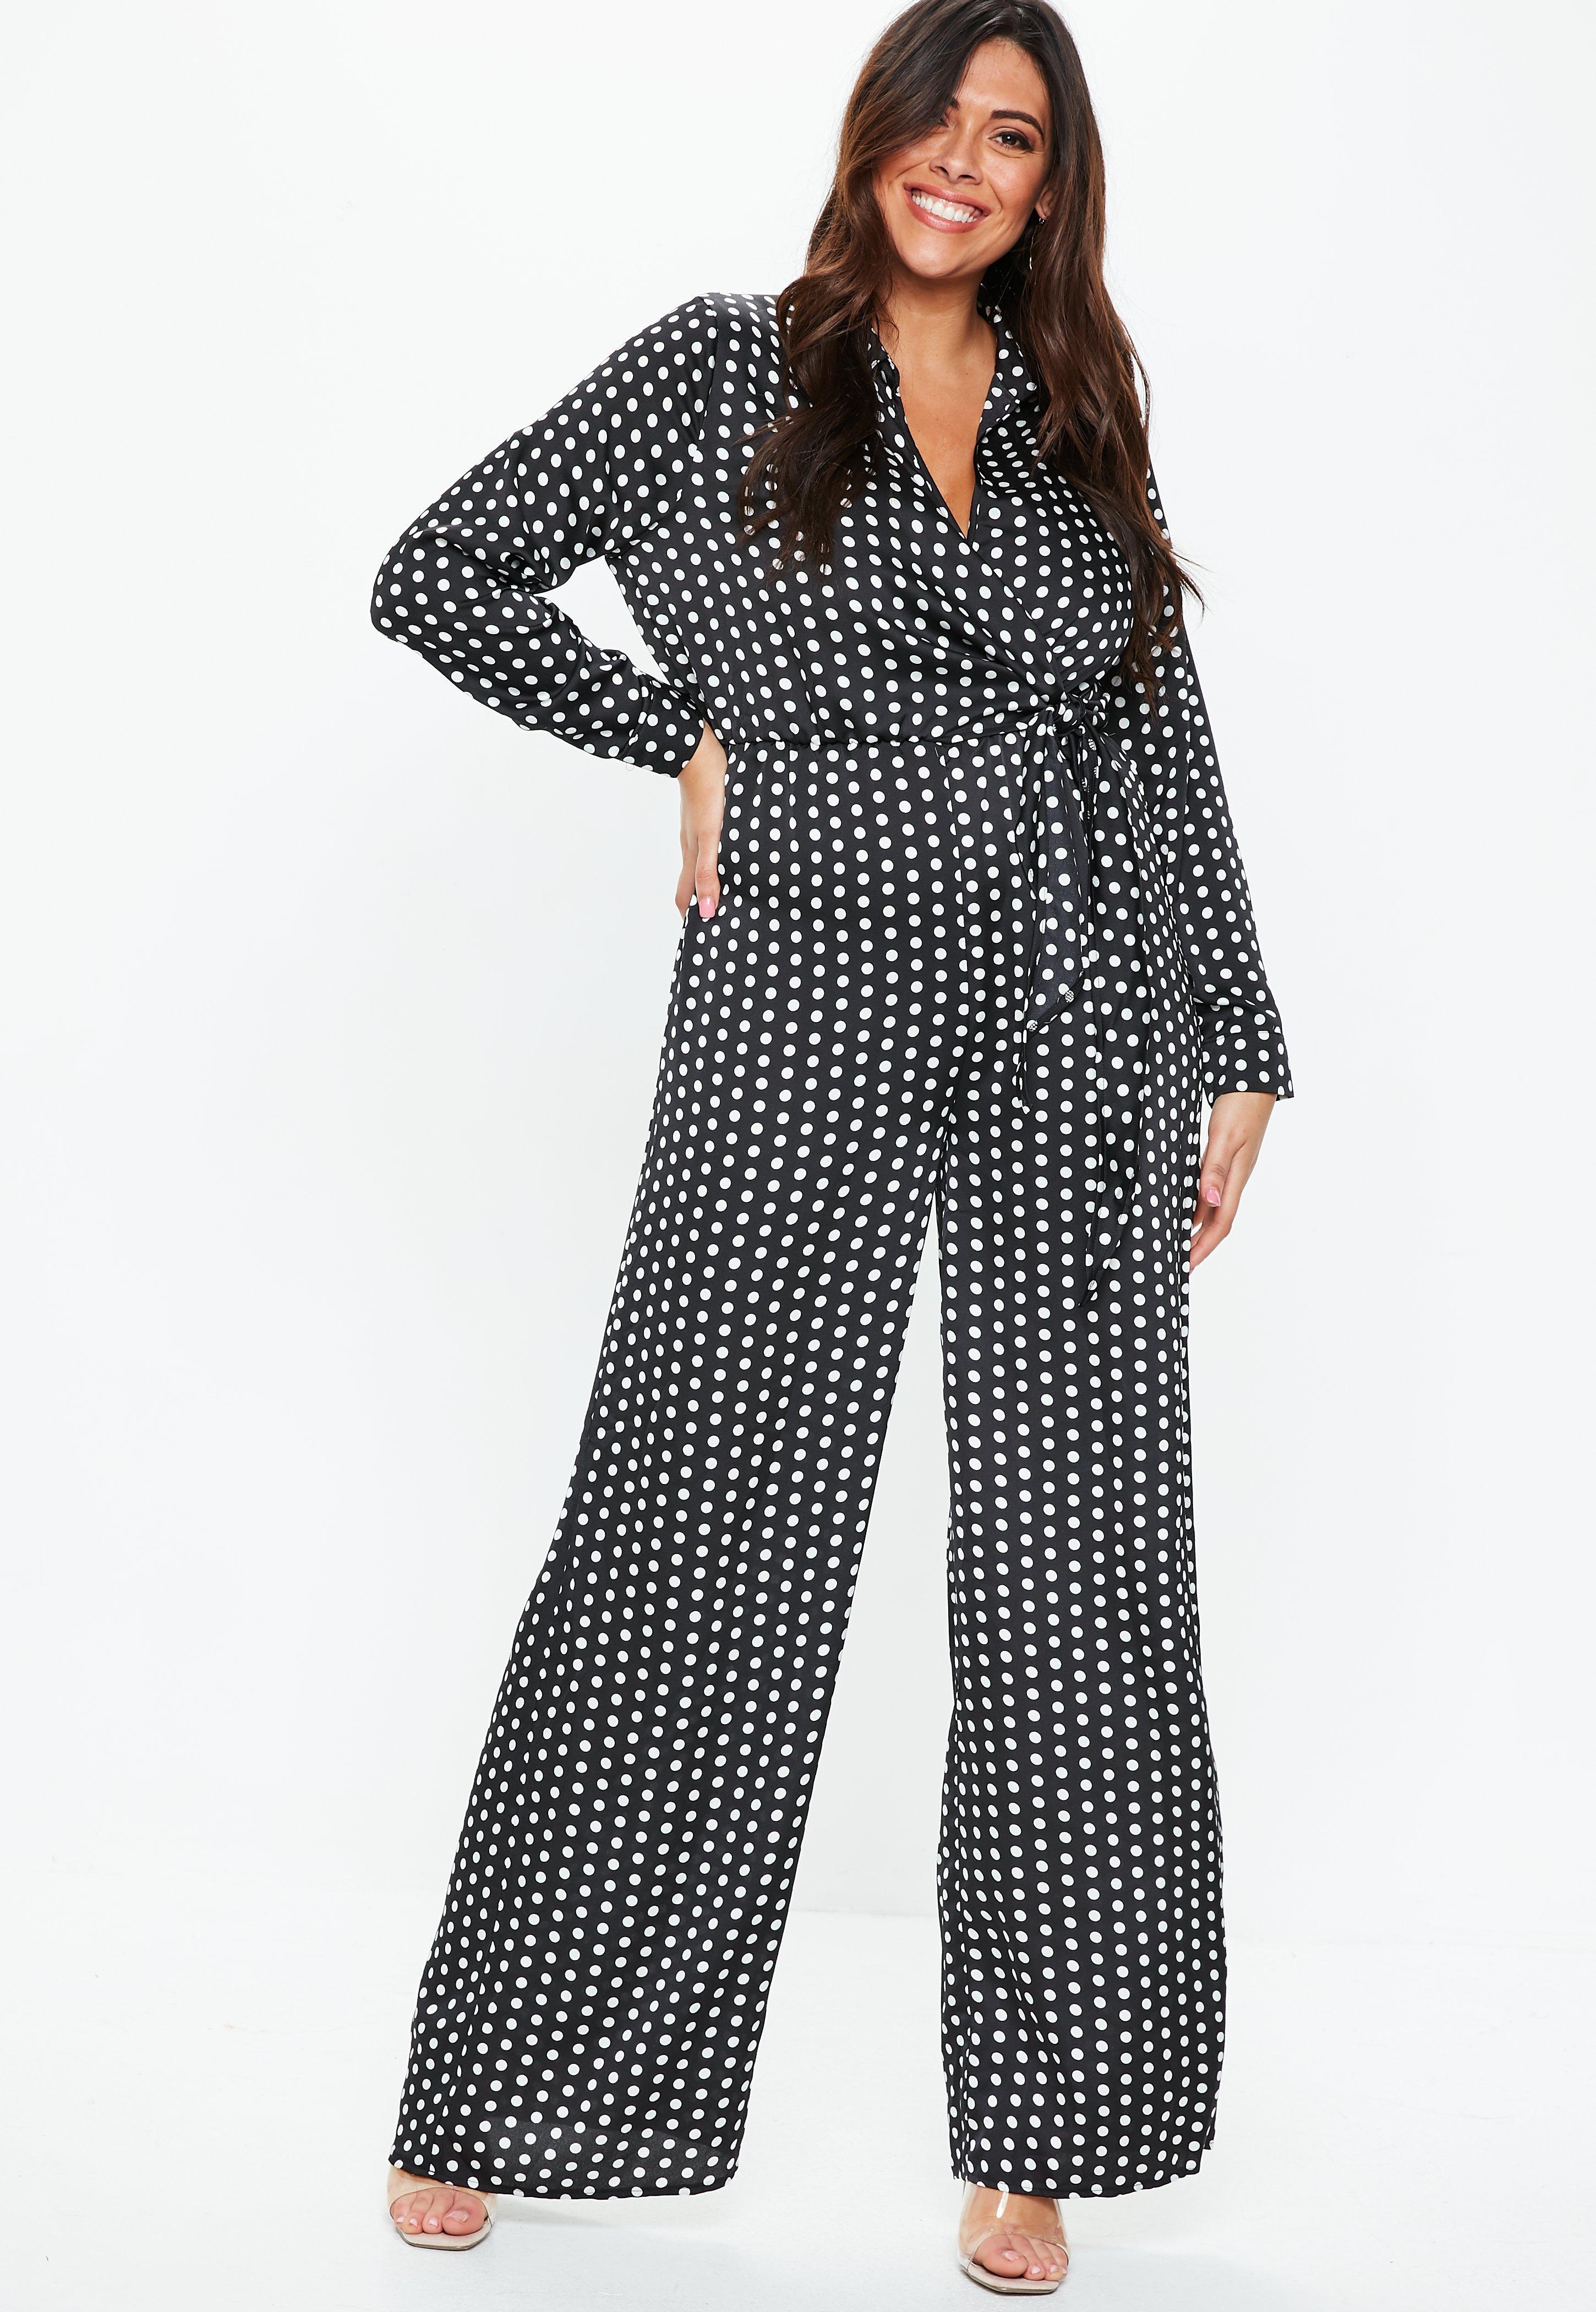 Mode grande taille   Vêtement femme grande taille - Missguided 3e73102455ef